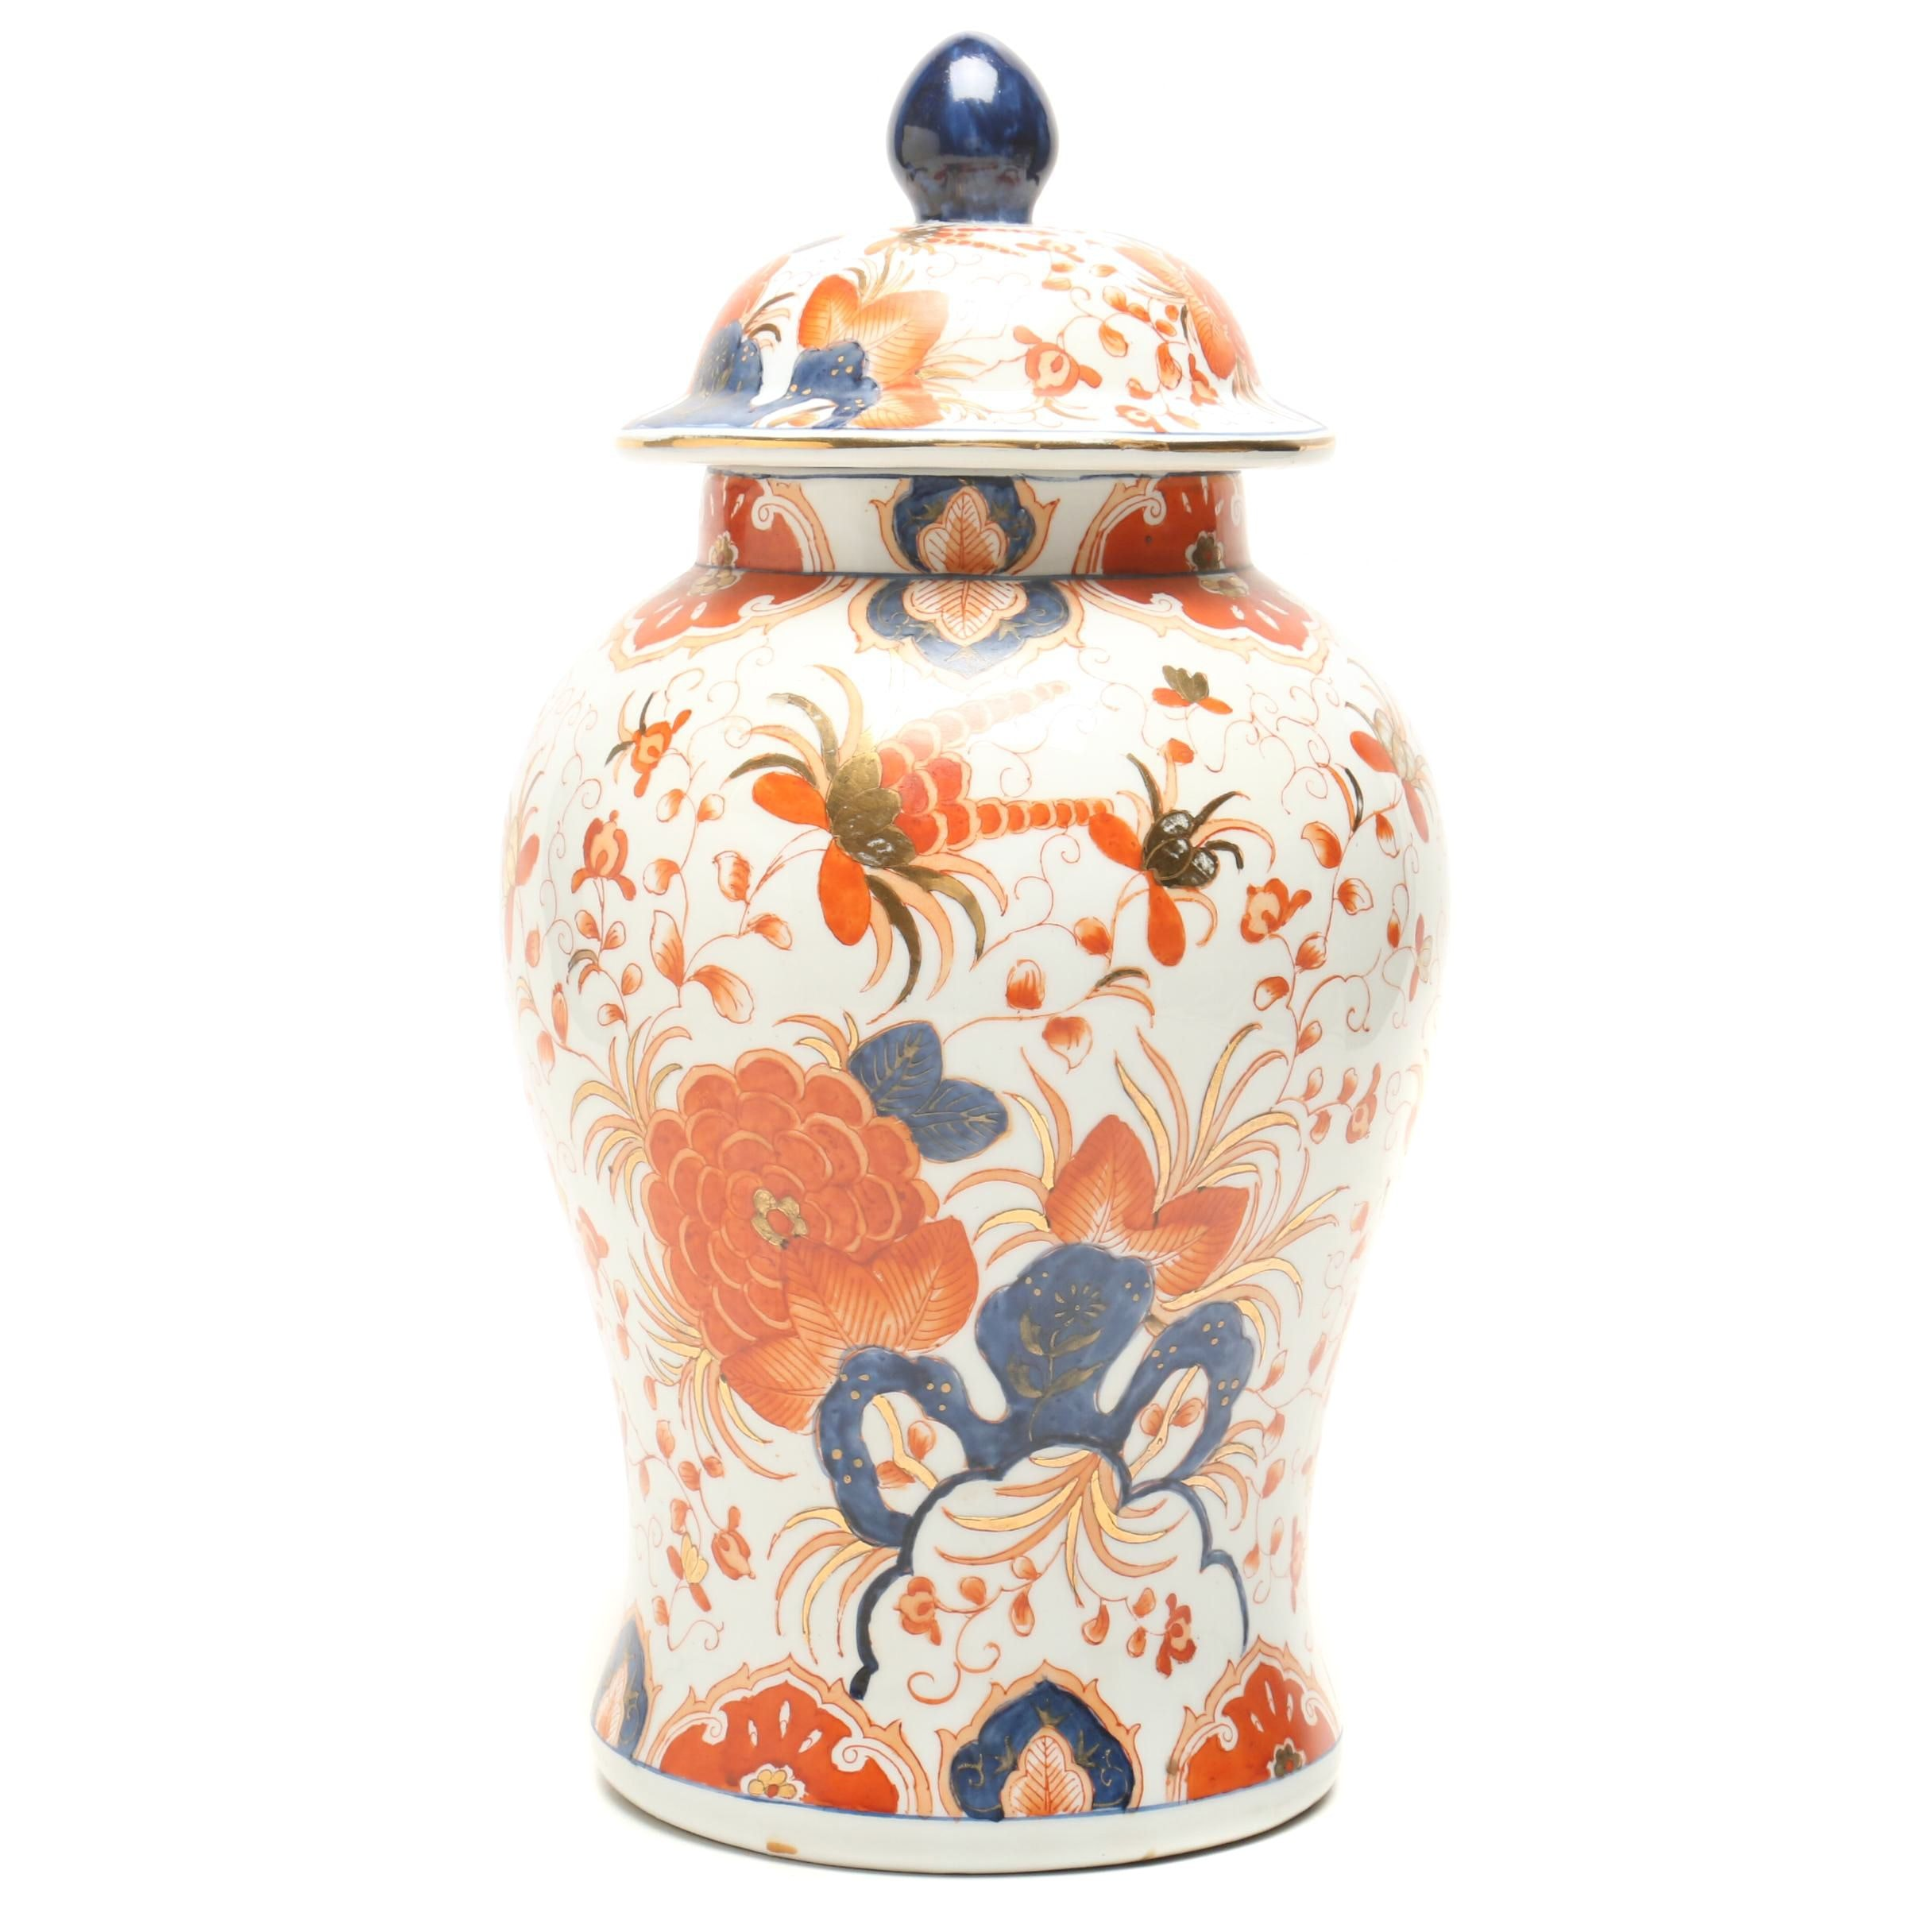 Vintage Chinese Imari Style Ginger Jar